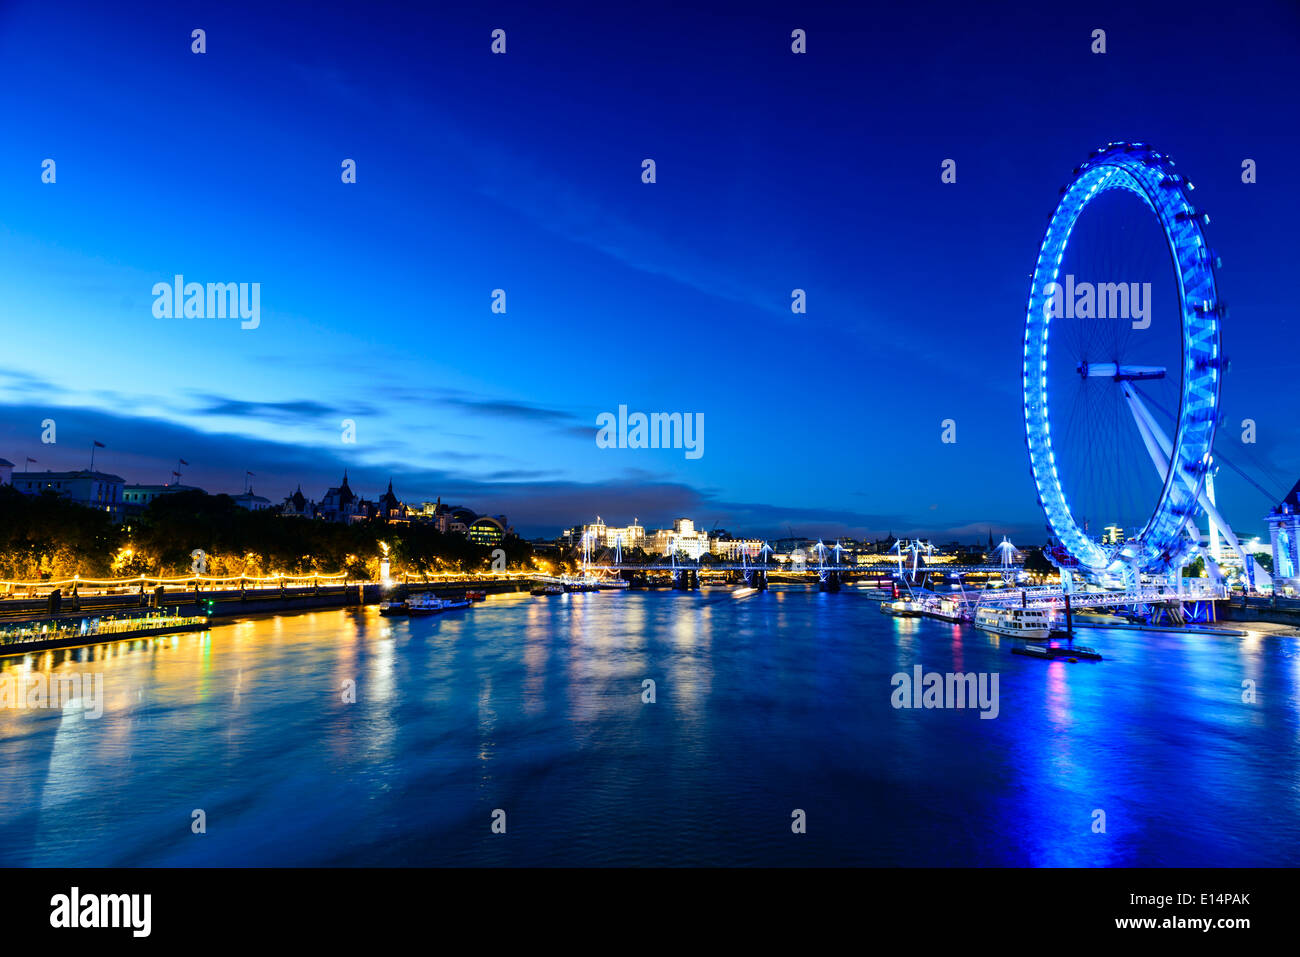 London Eye overlooking river front, London, United Kingdom - Stock Image